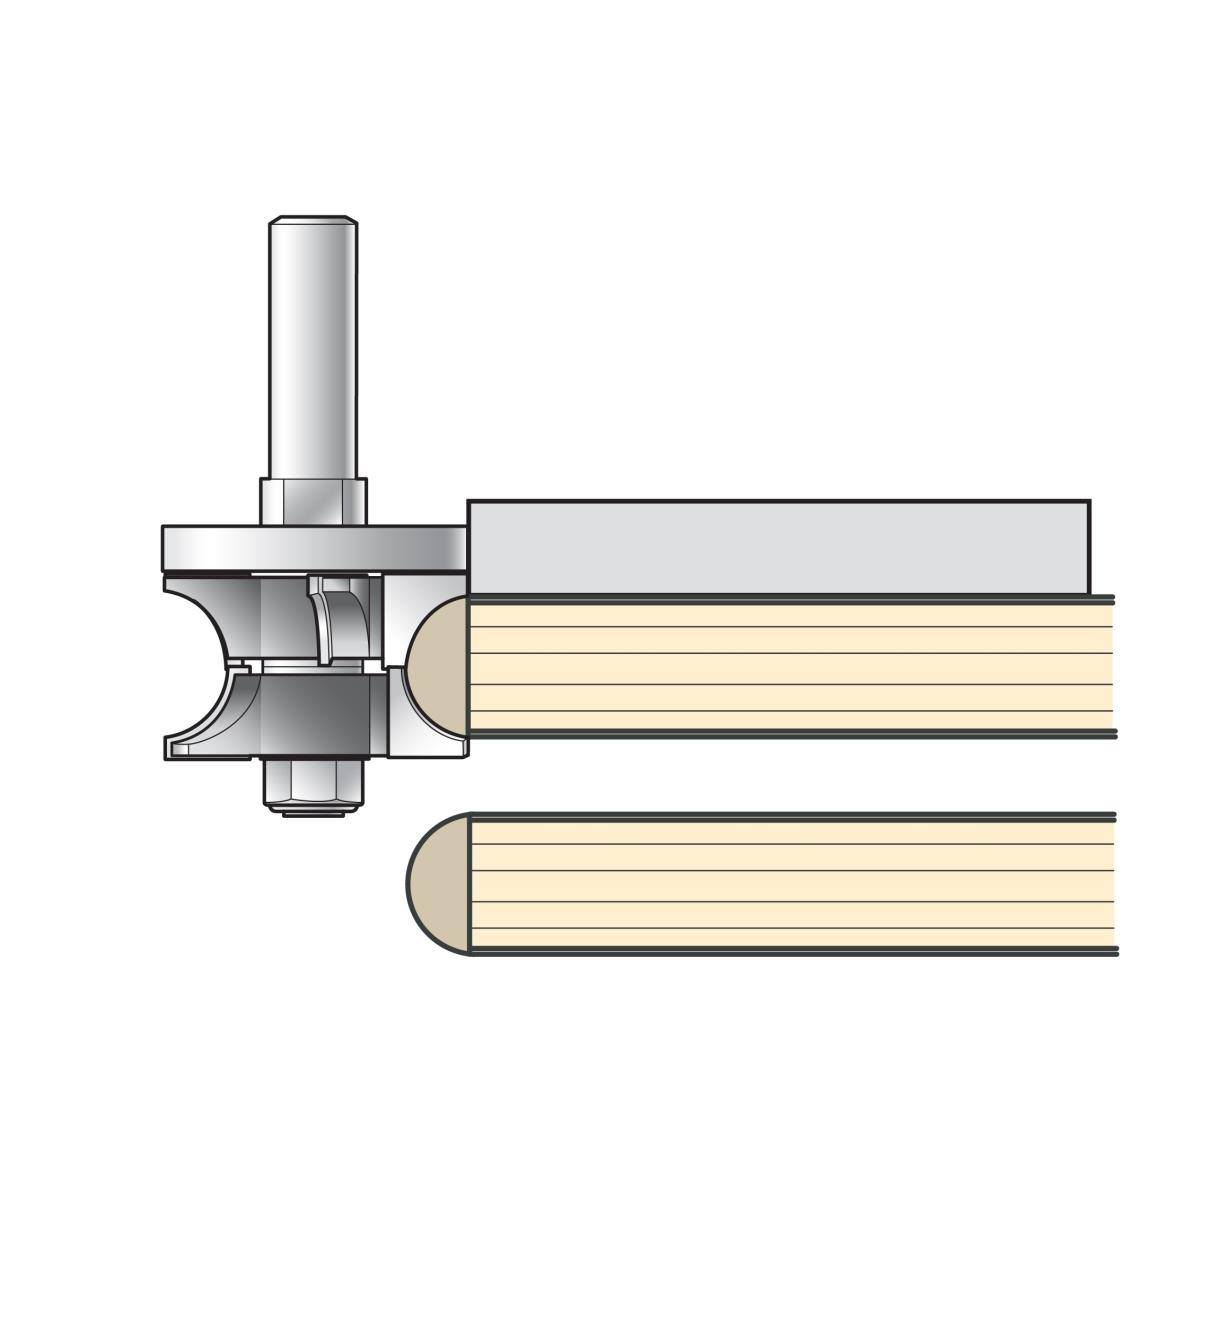 16J9403 - Adjustable Bullnose Edging Bit